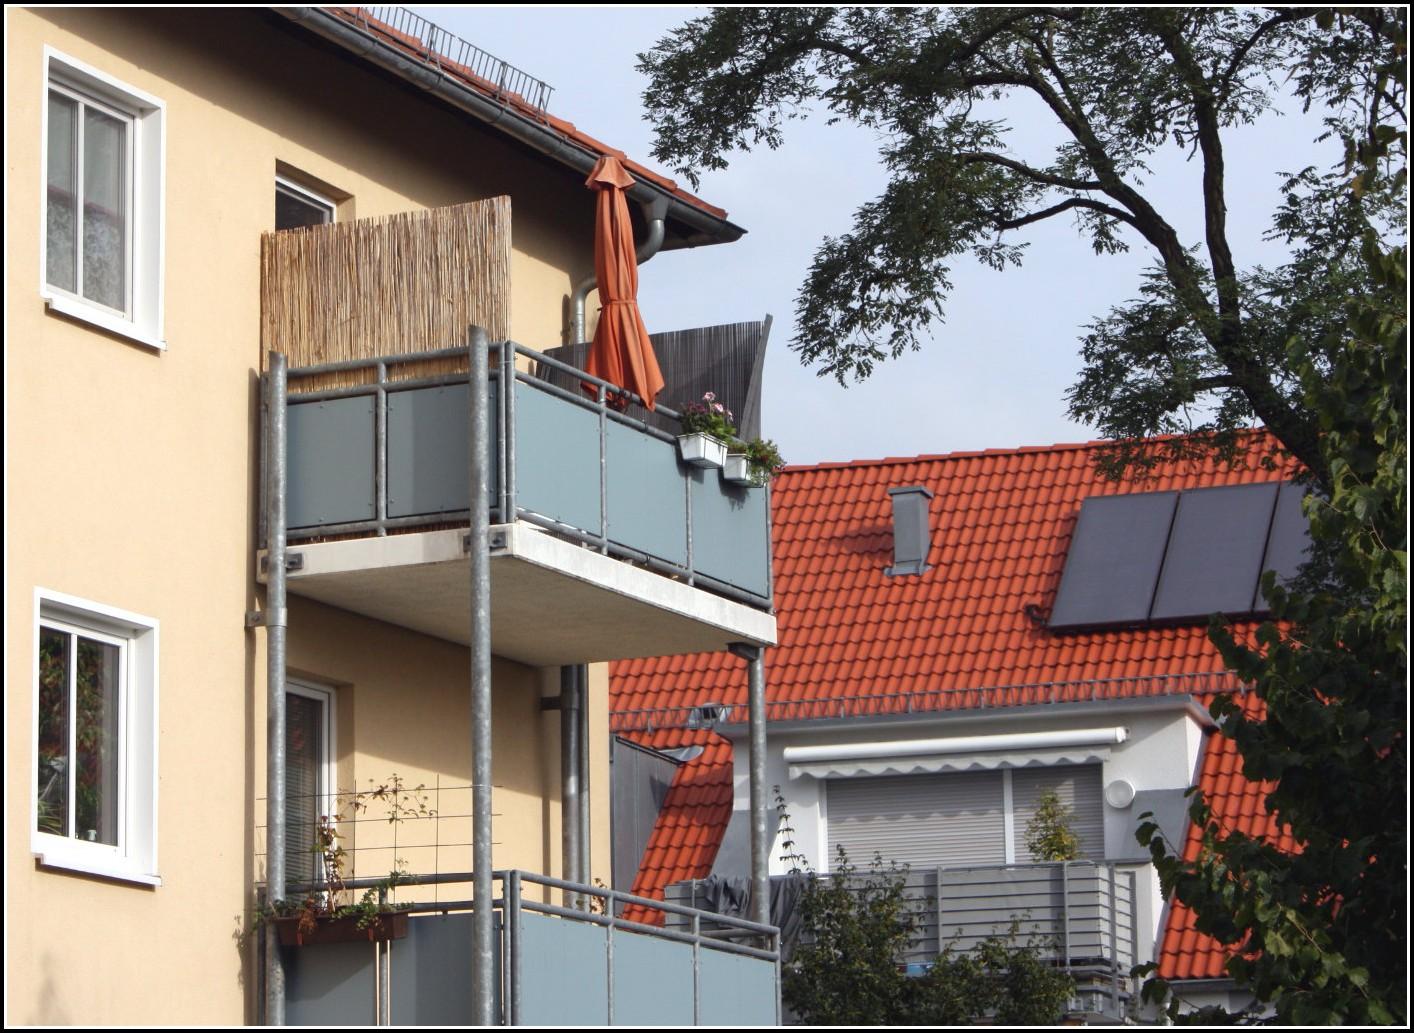 Balkon Sichtschutz Stoff Braun Dolce Vizio Tiramisu